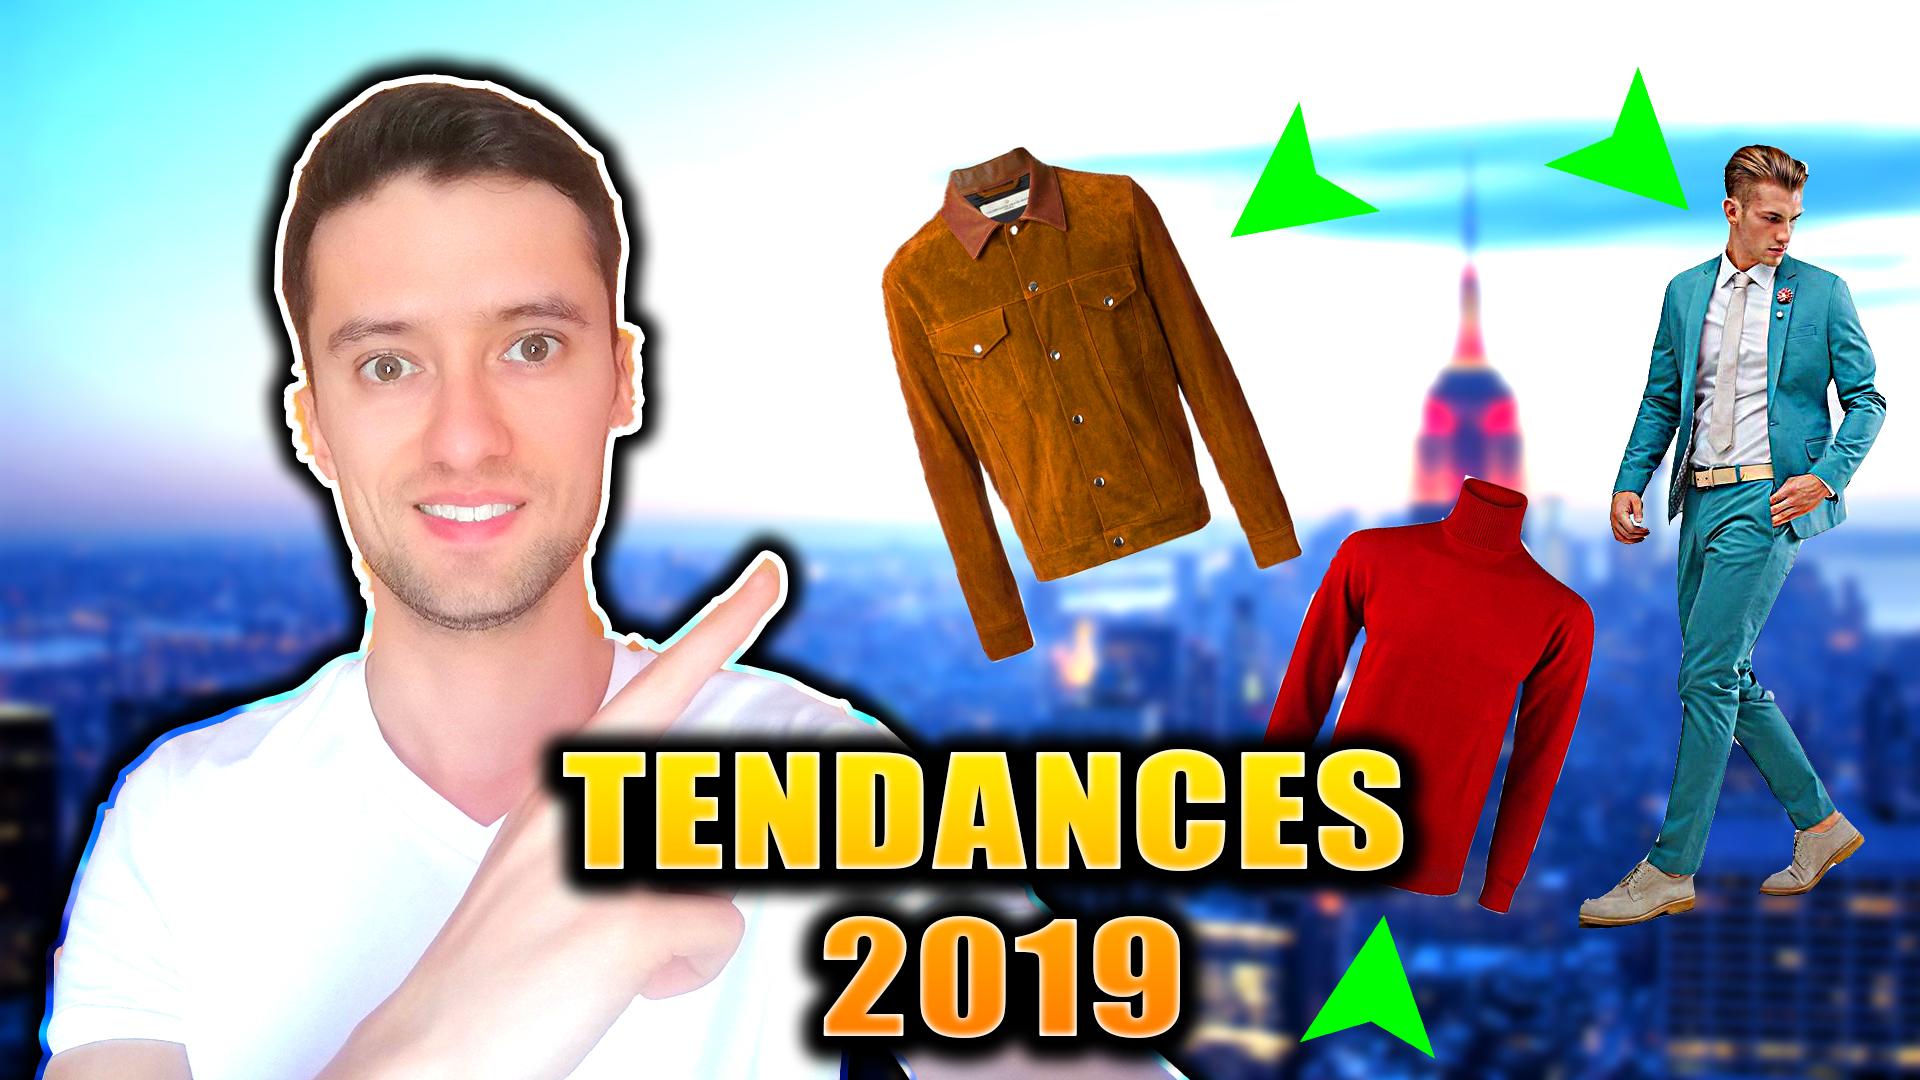 meilleures tendances mode 2019 homme